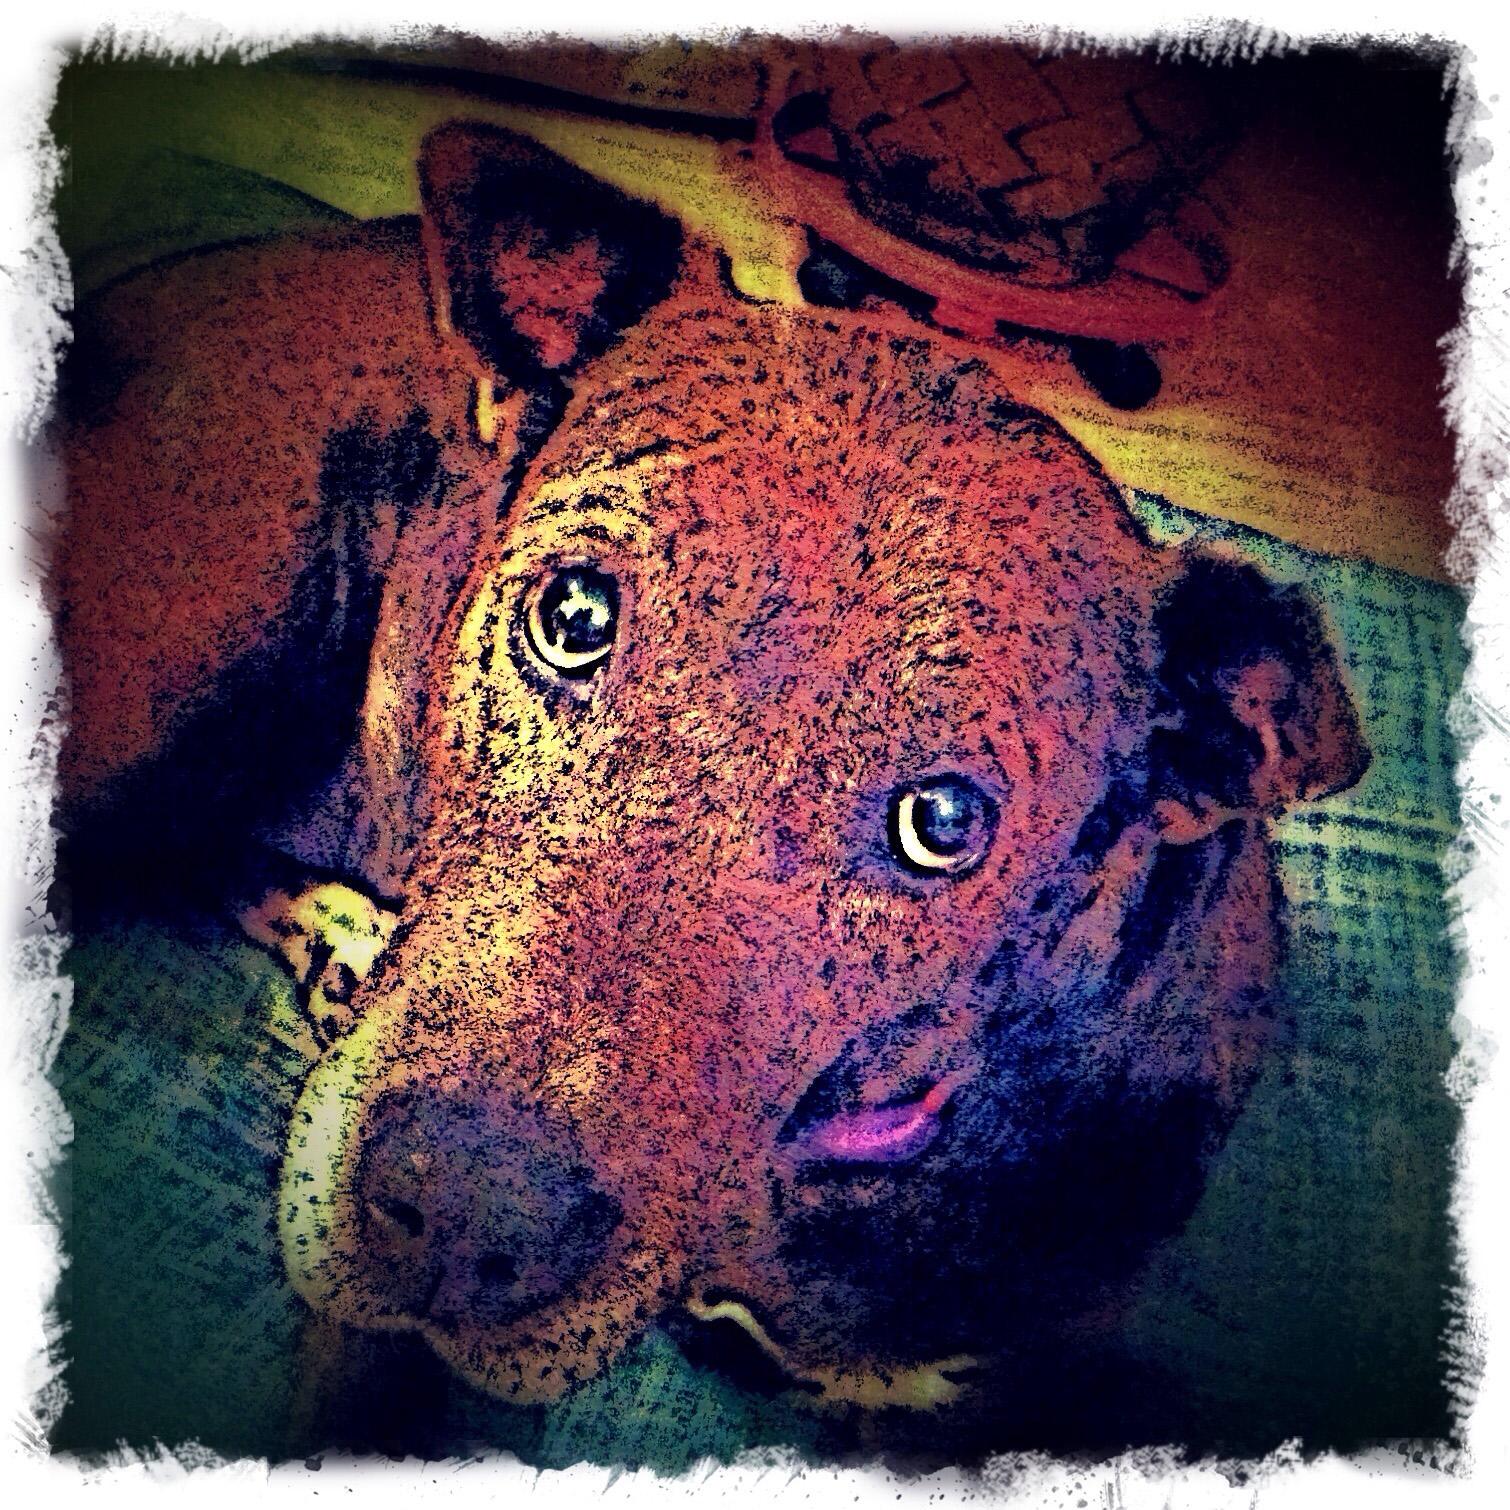 Pit Bull Mix Dog - Custom Digital Fine Art Pet Portrait by Animal Artist BZTAT